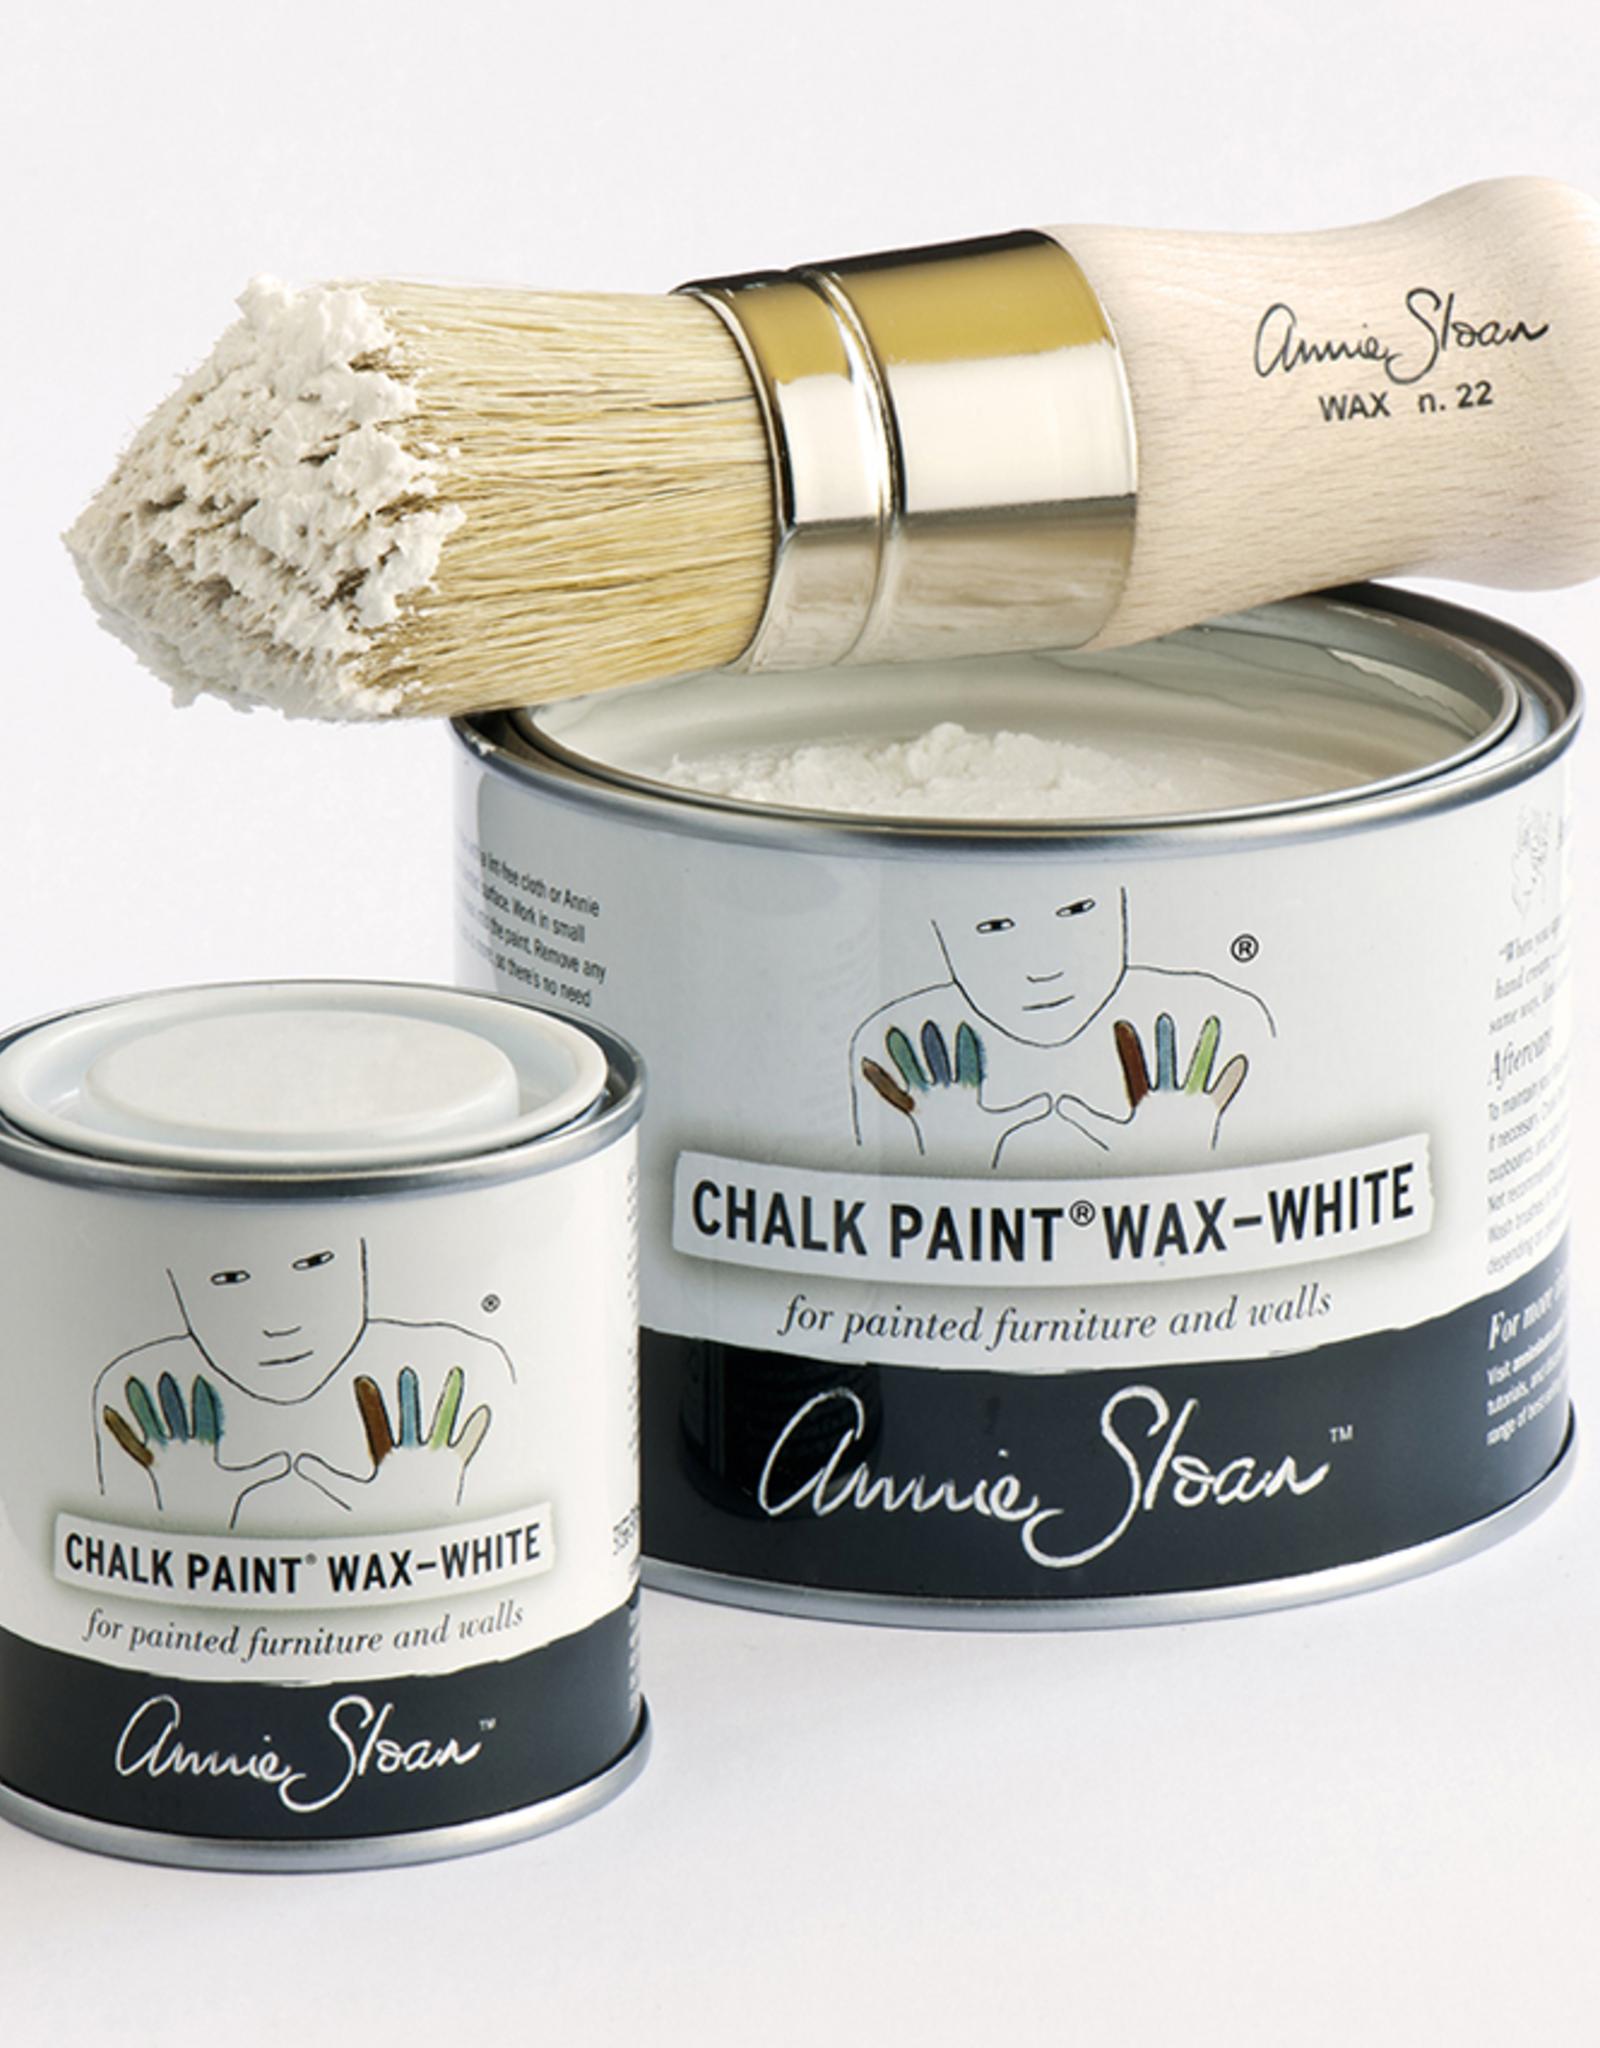 Chalk Paint Wax - White